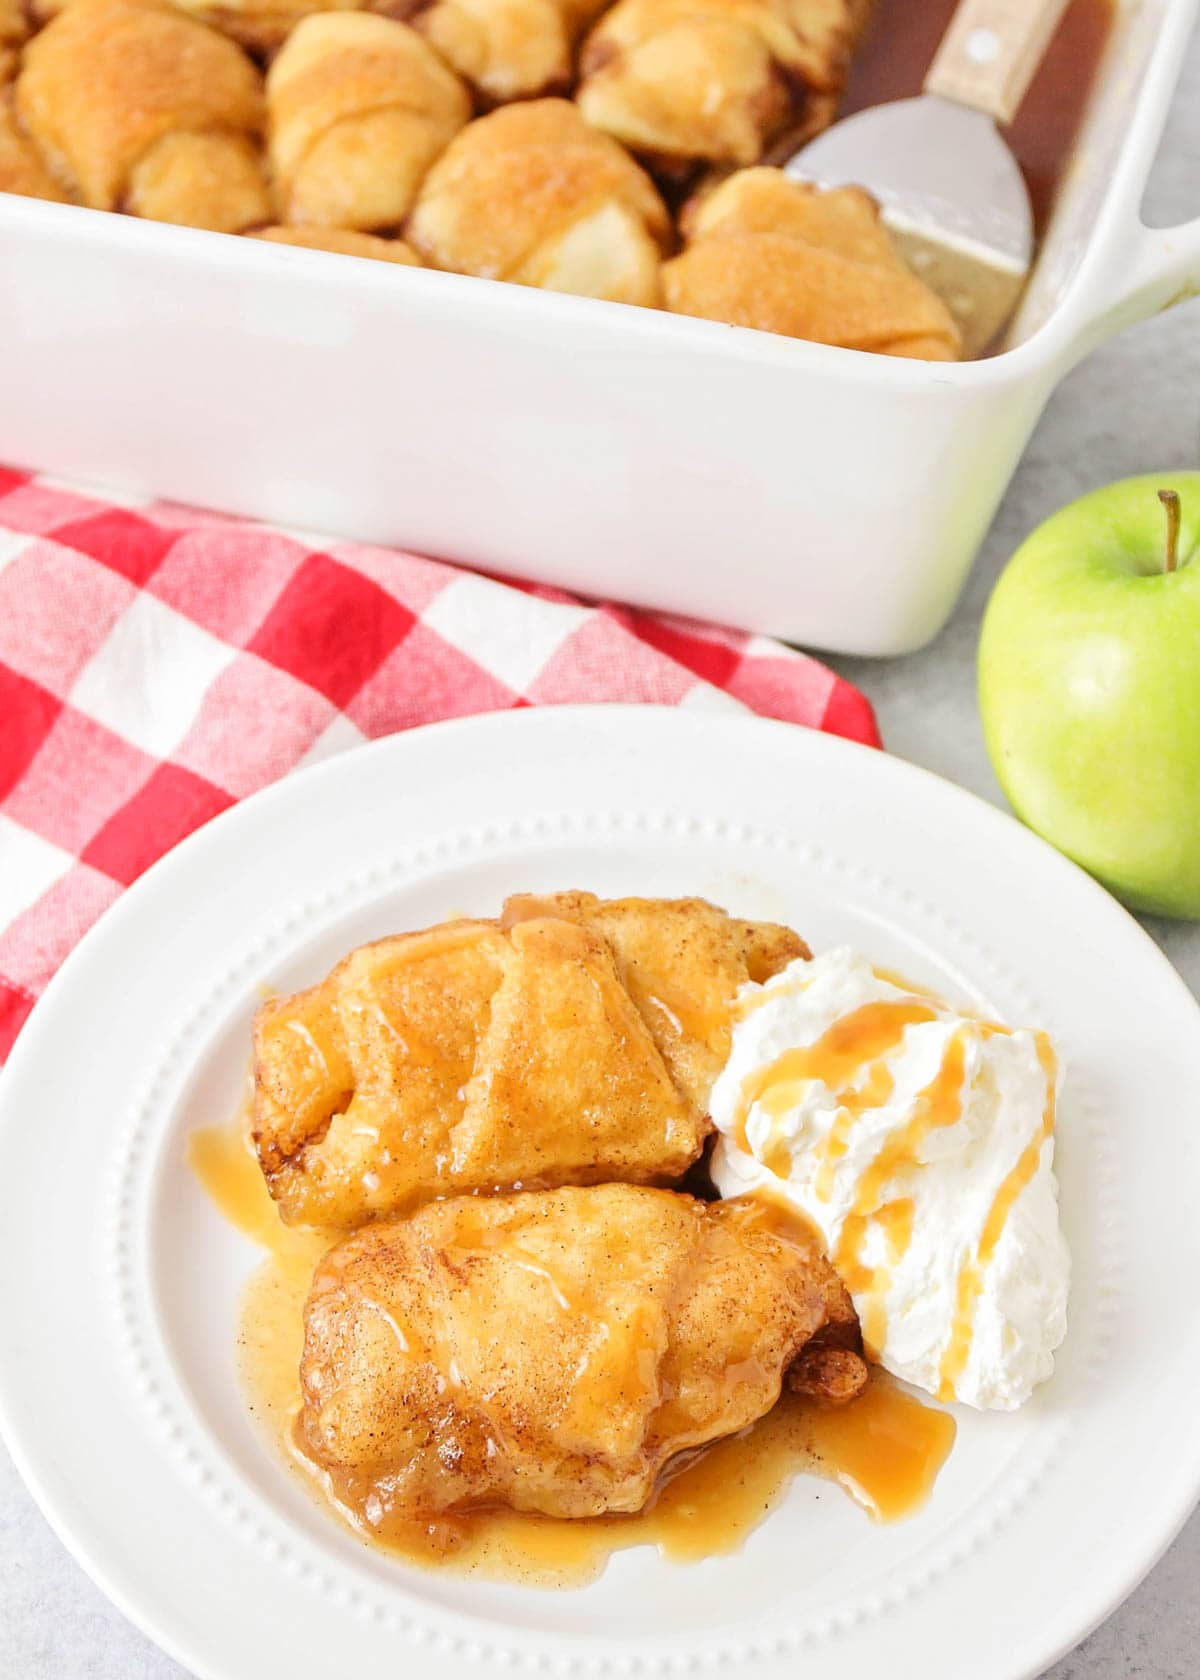 Apple crescent dumplings on a white plate